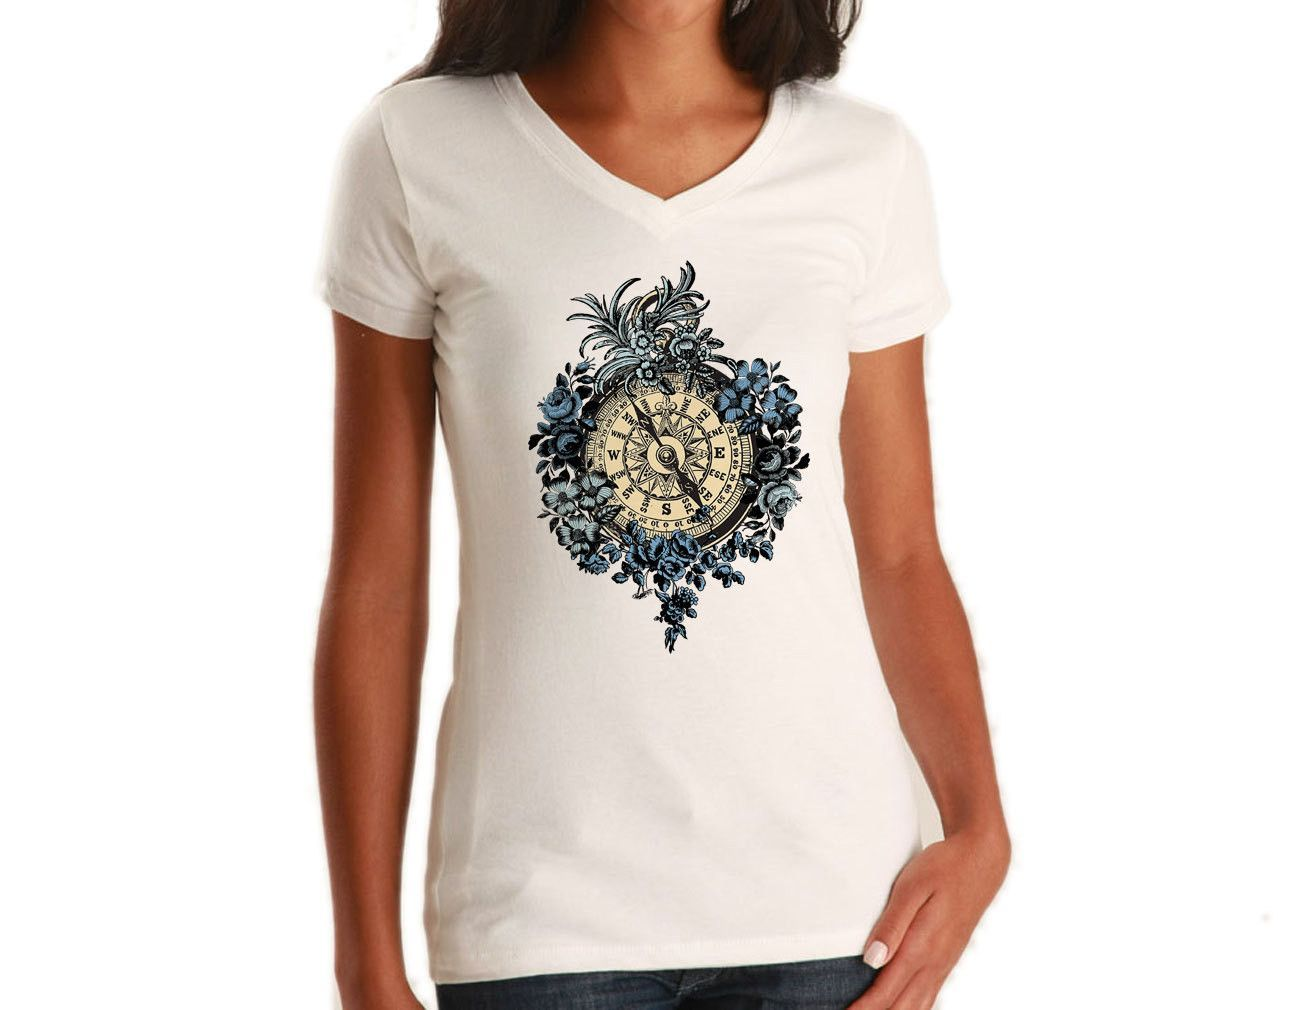 Women's Vintage Floral Compass Vneck T-Shirt - Juniors Fit Feminine Tattoo Inspired